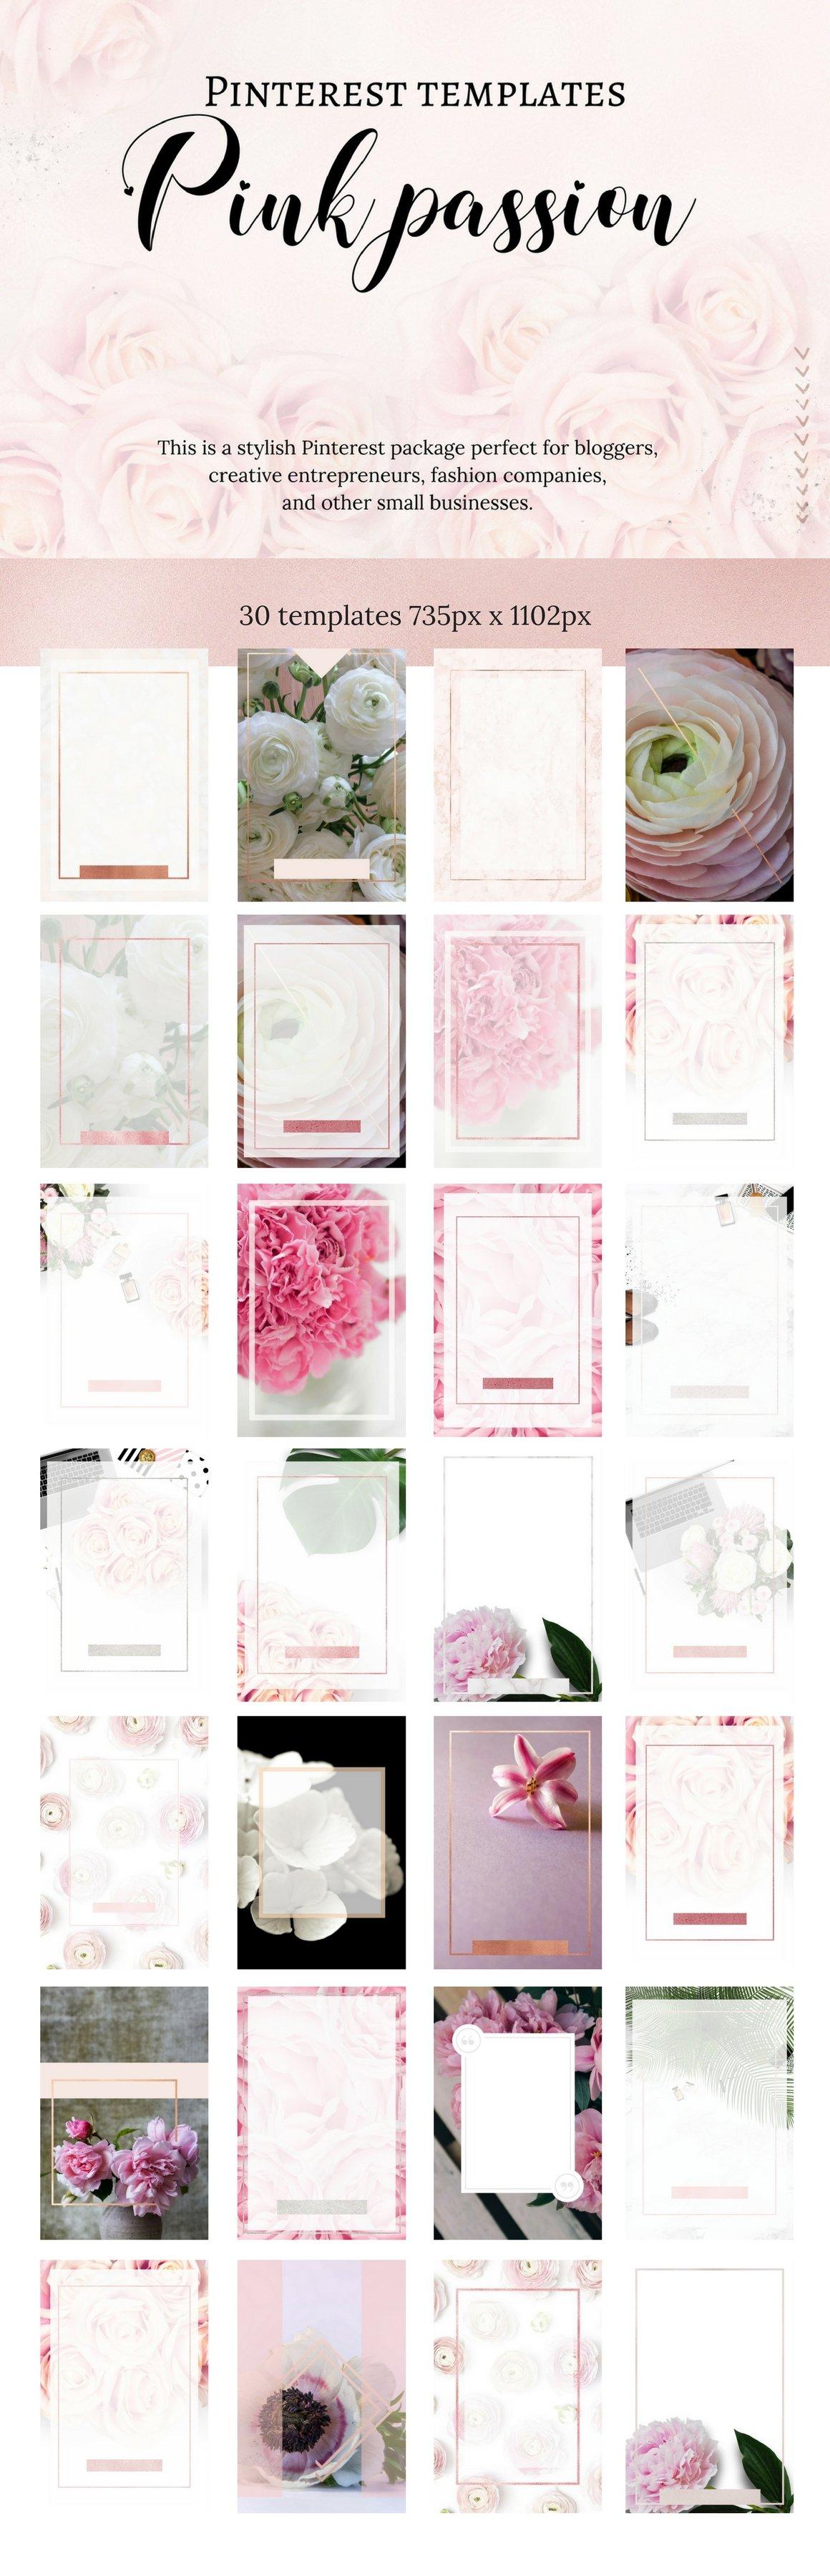 Pinterest templates- Pink passion